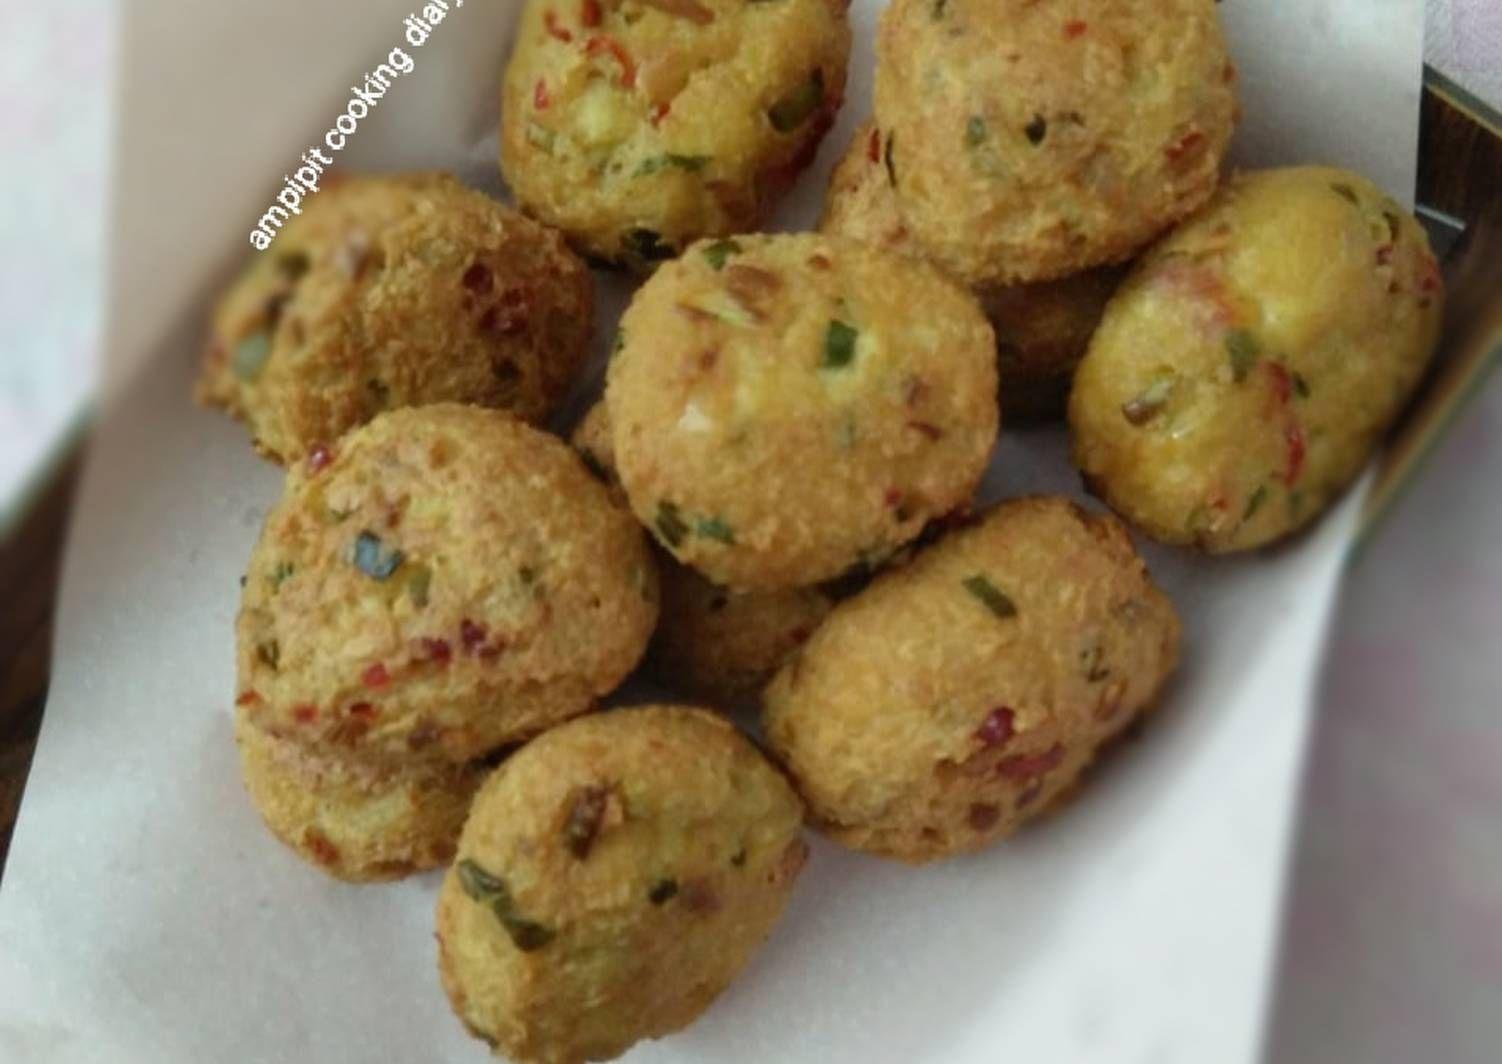 Resep Perkedel Tahu Ayam Oleh Pitraratri Resep Masakan Resep Makanan